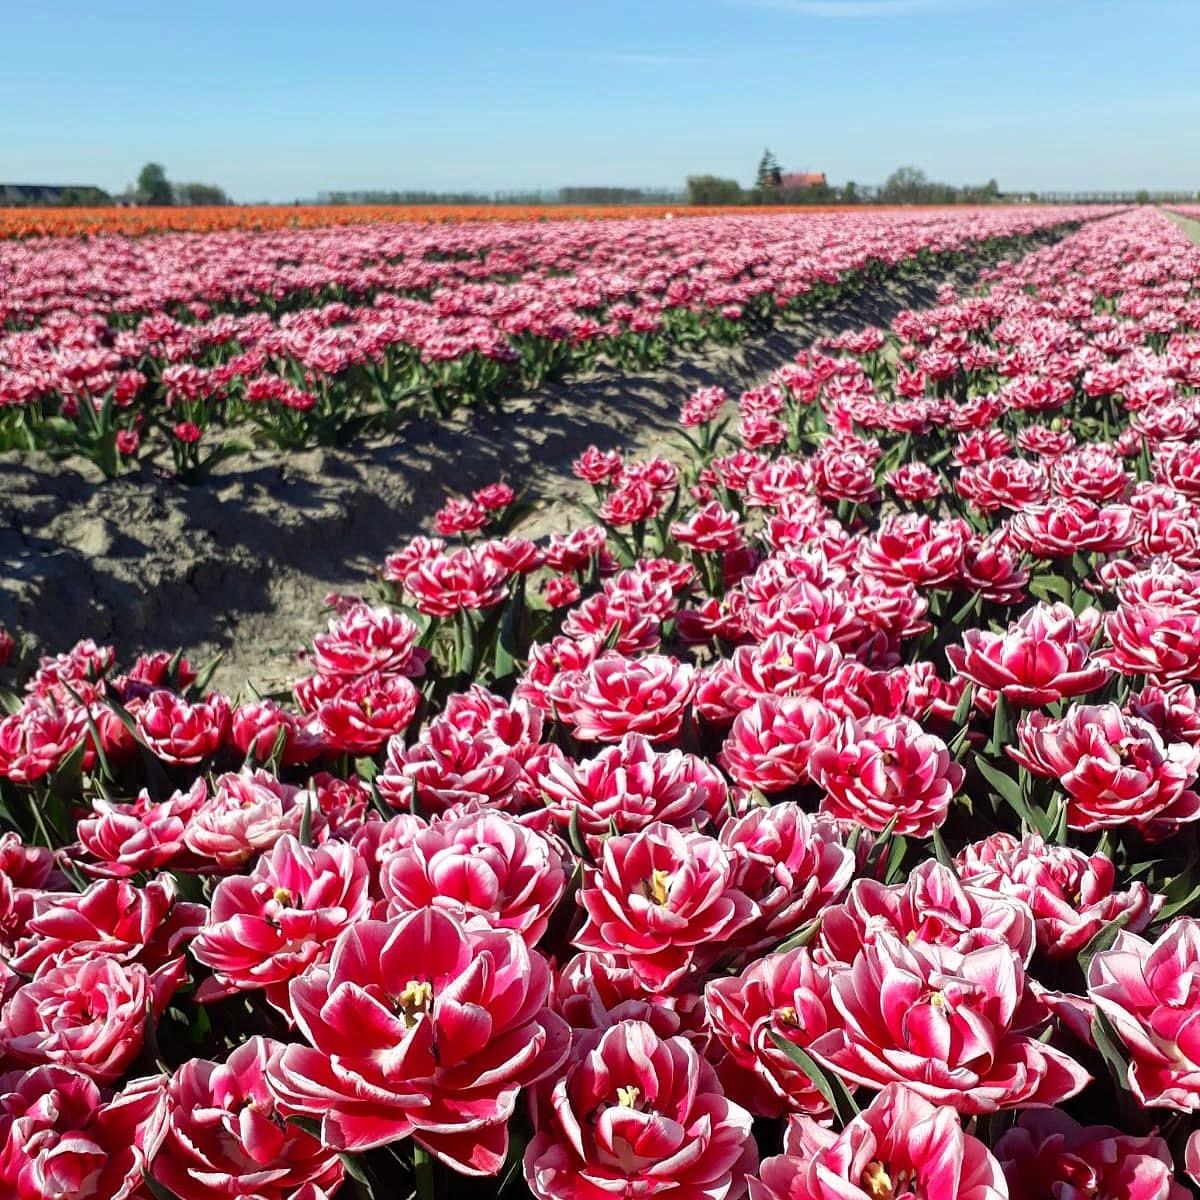 Nederlandse tulpenvelden - Interview met Johanna